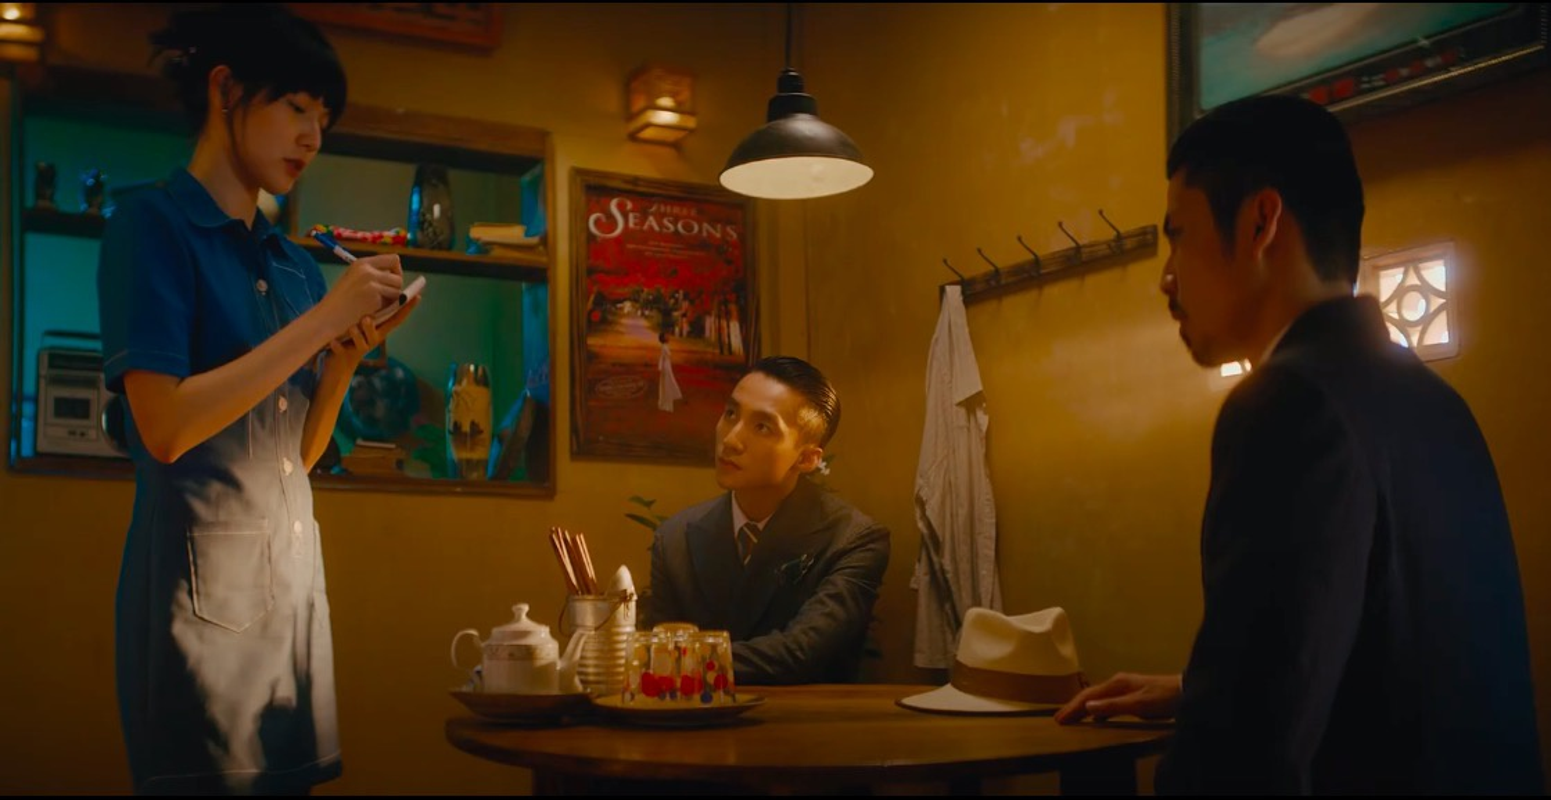 Nhung tinh tiet gay tranh luan trong MV cua Son Tung-Hinh-4